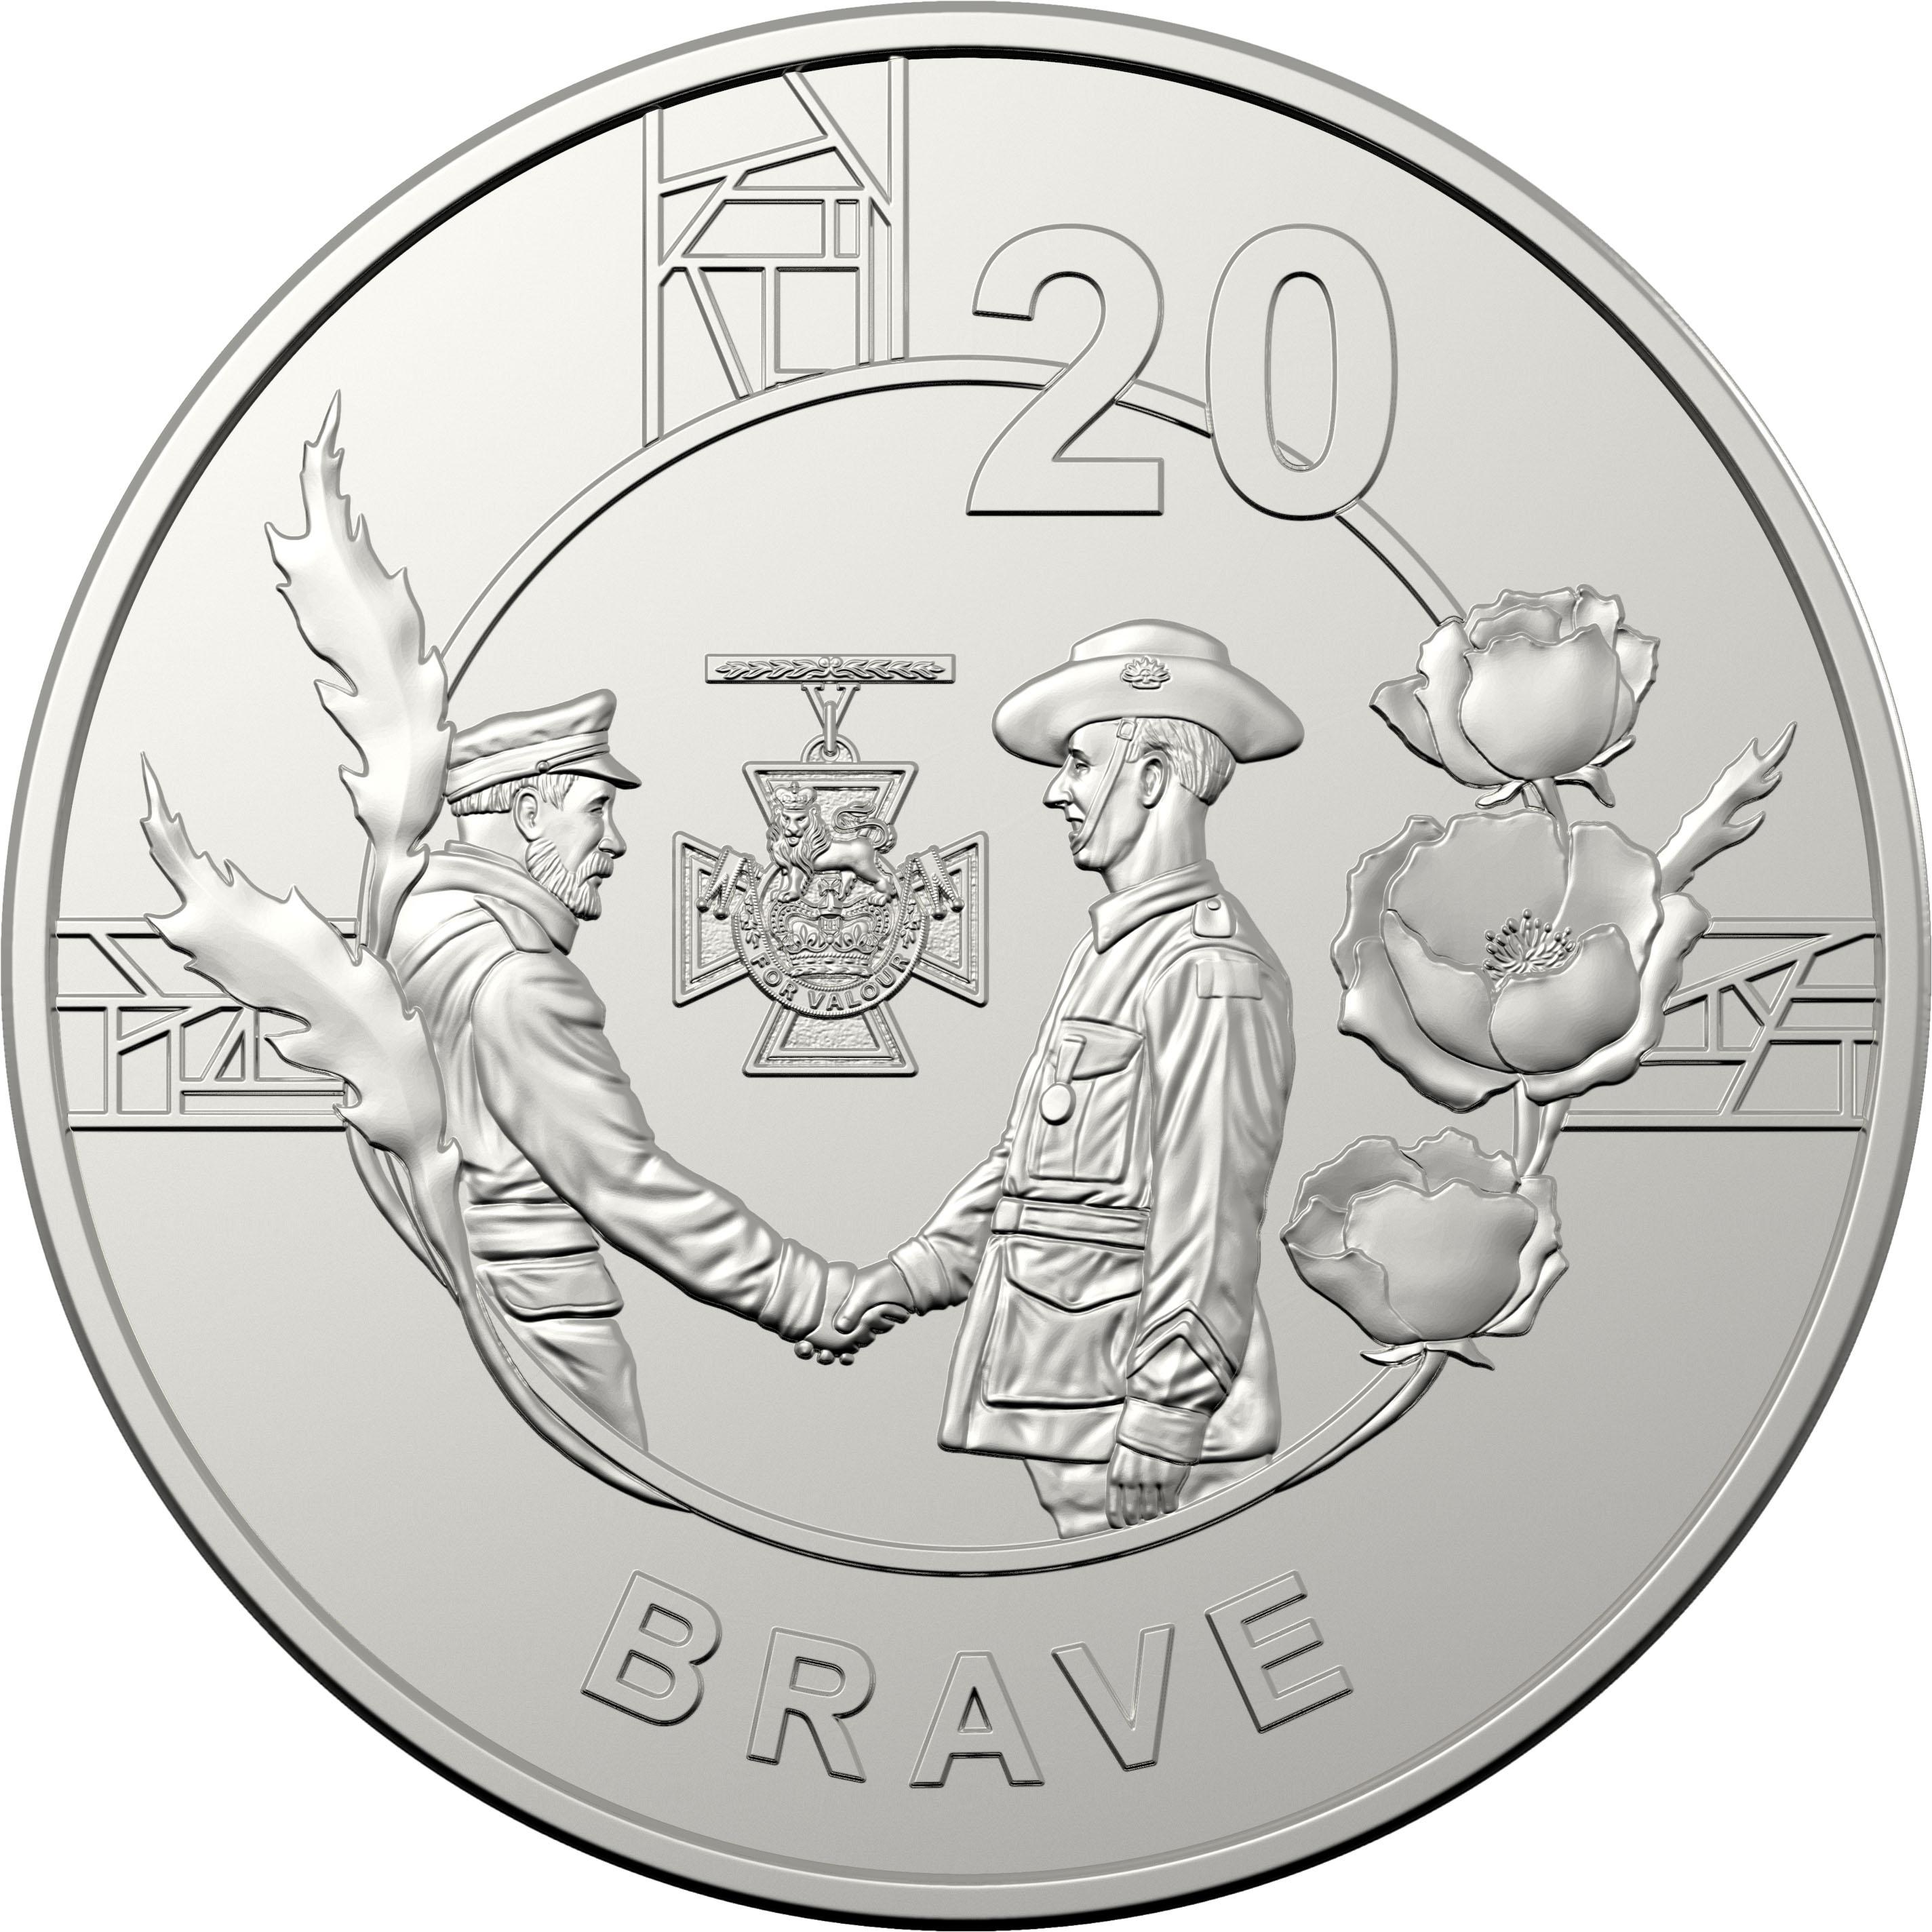 Australian Commemorative Coins Australia - lists - The Coin